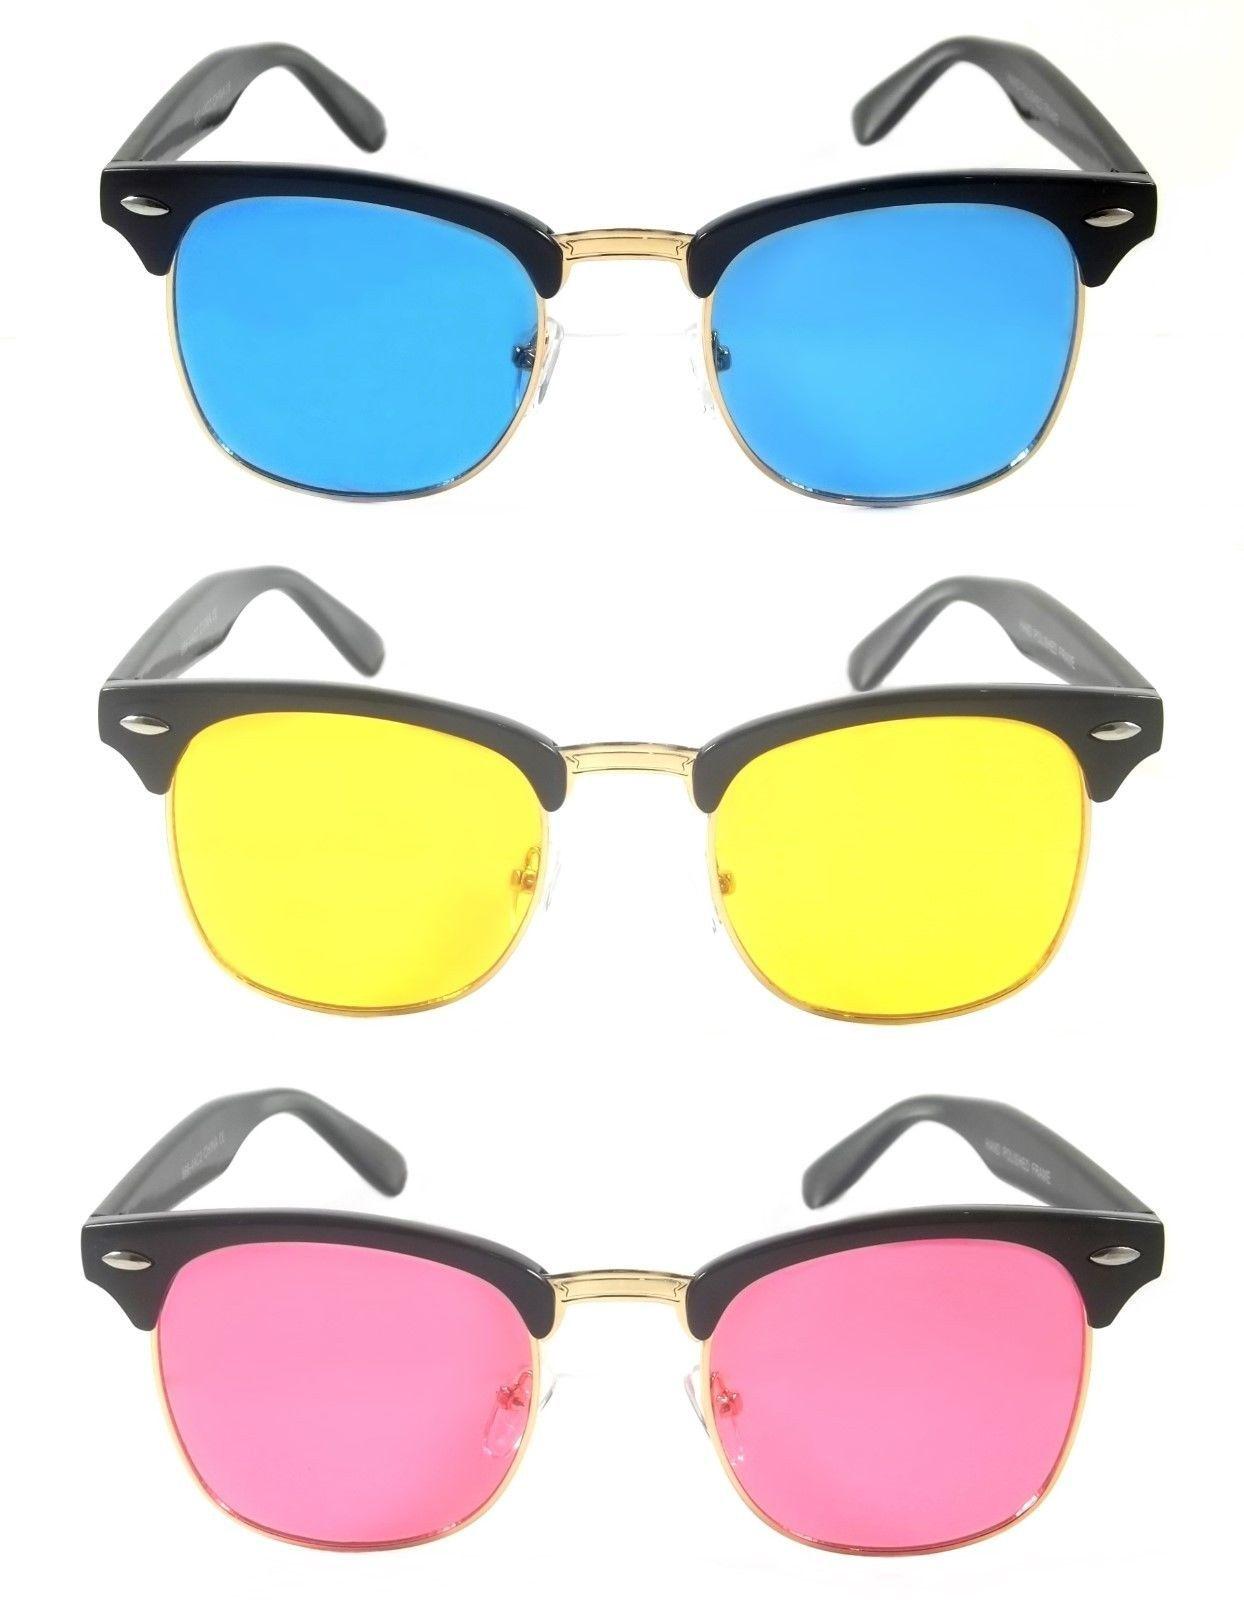 $9.95 - Retro Club-Master Sunglasses Men Women Hicks Vintage Style ...